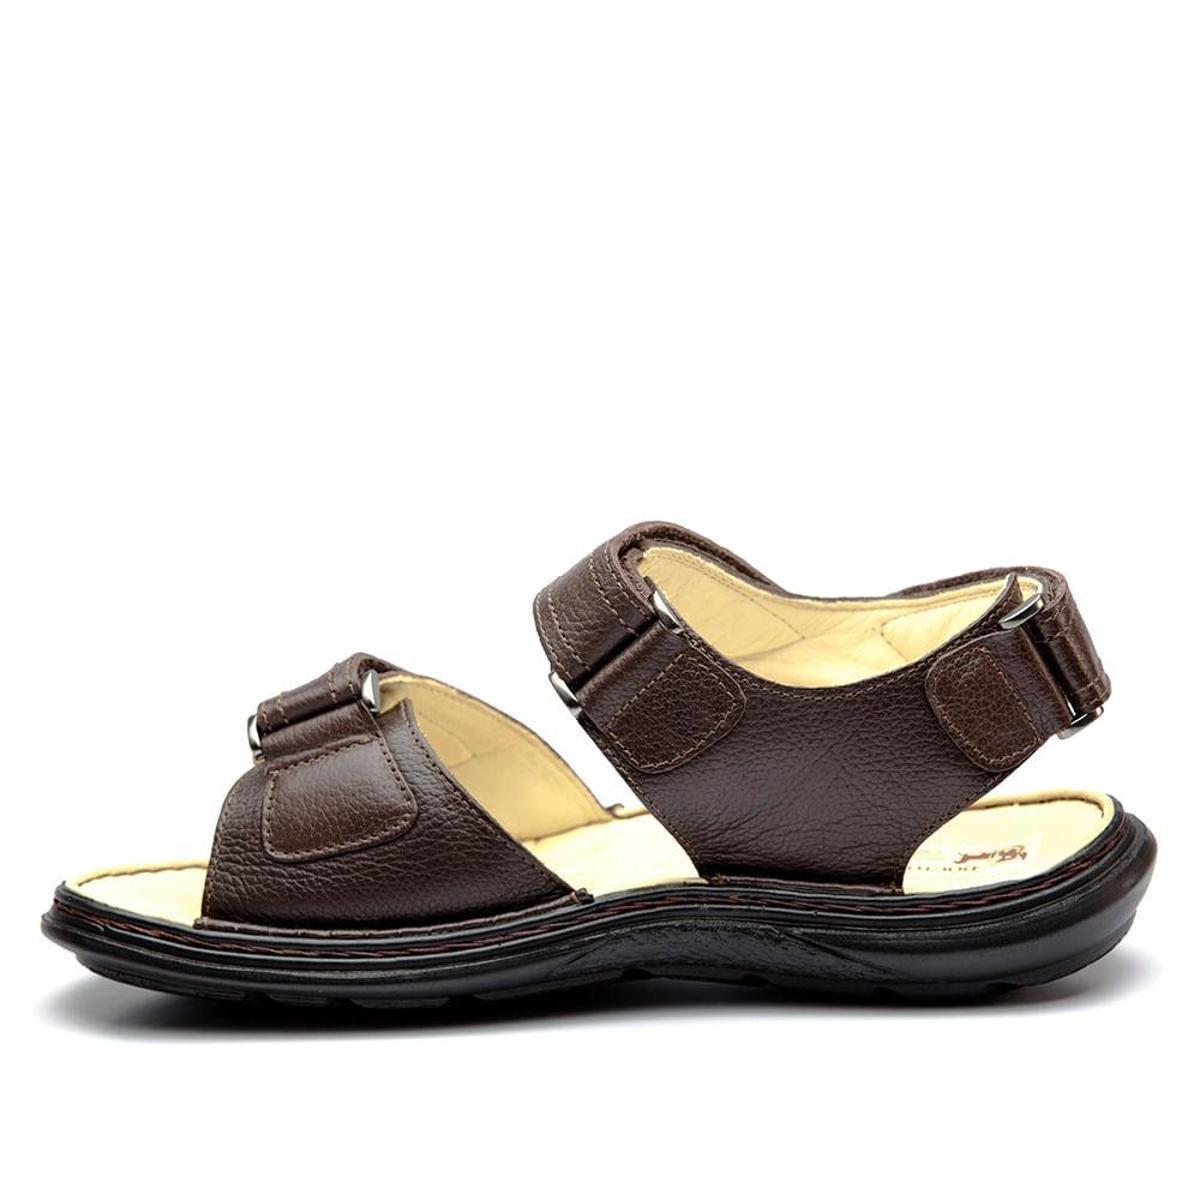 Sandália Doctor Shoes Comfort 917301 - Marrom